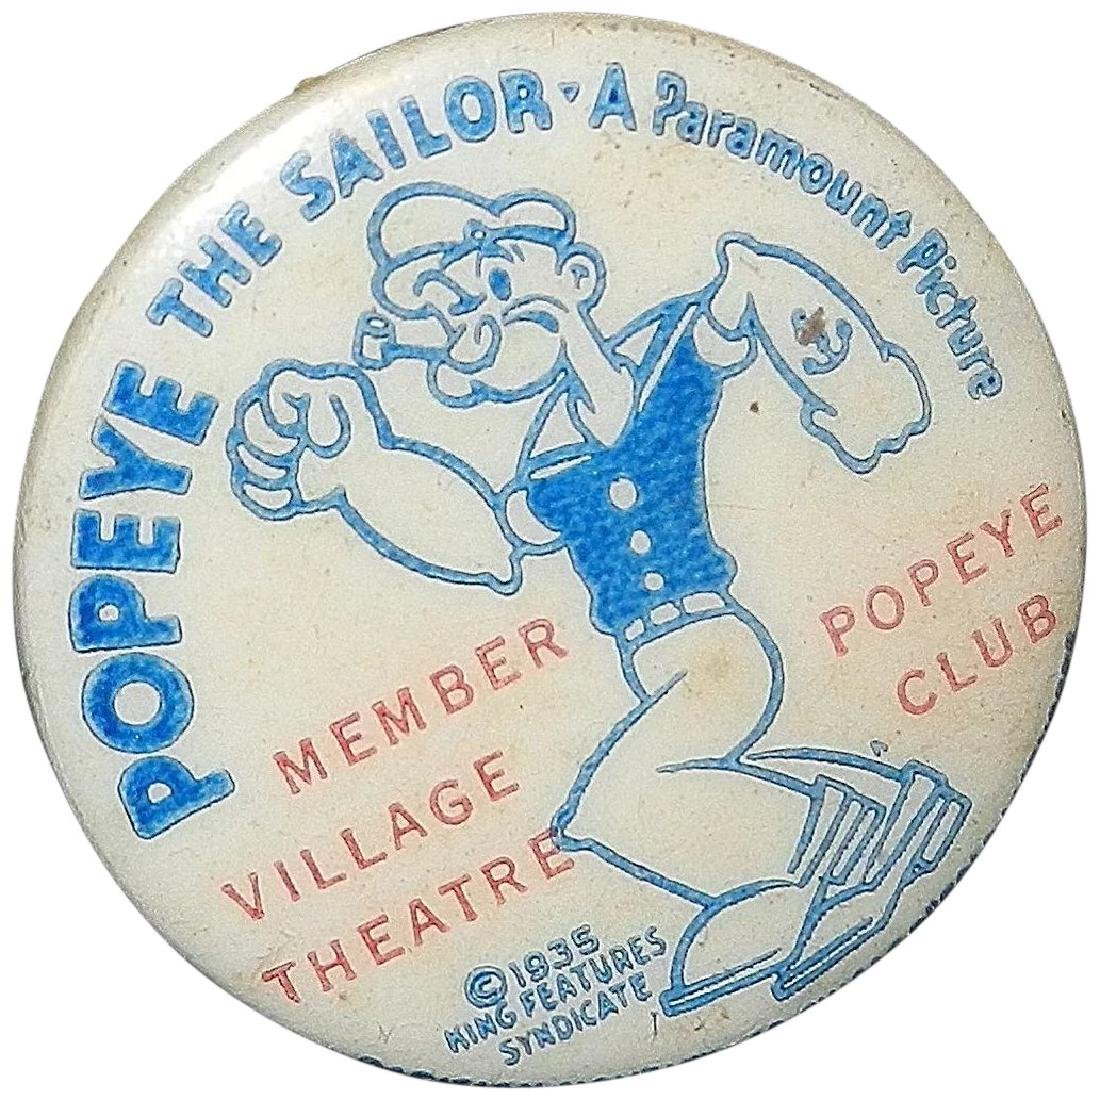 Vintage Popeye the Sailor Pinback Button- Paramount